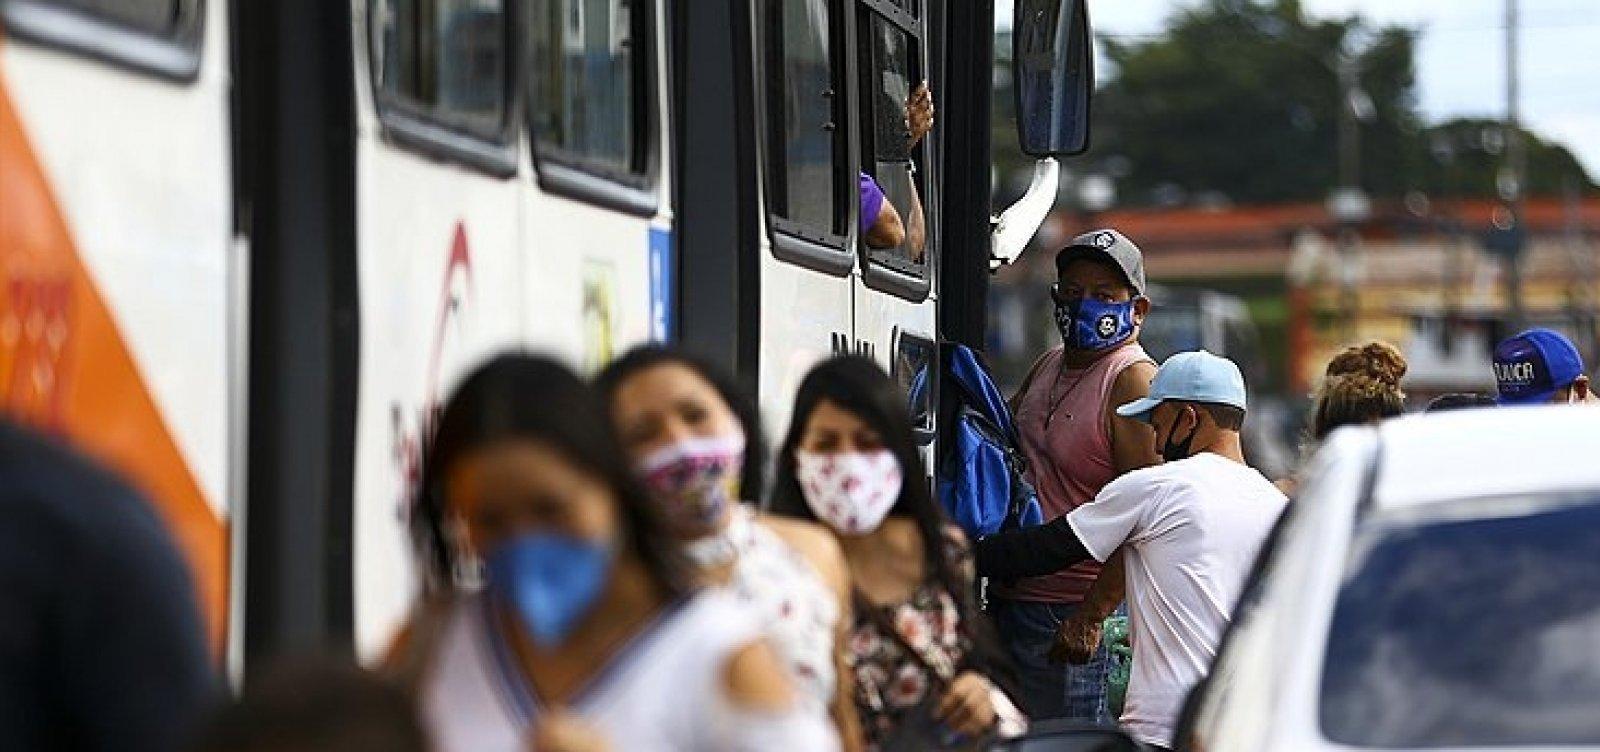 Brasil atinge marca de 6 milhões de casos de Covid-19